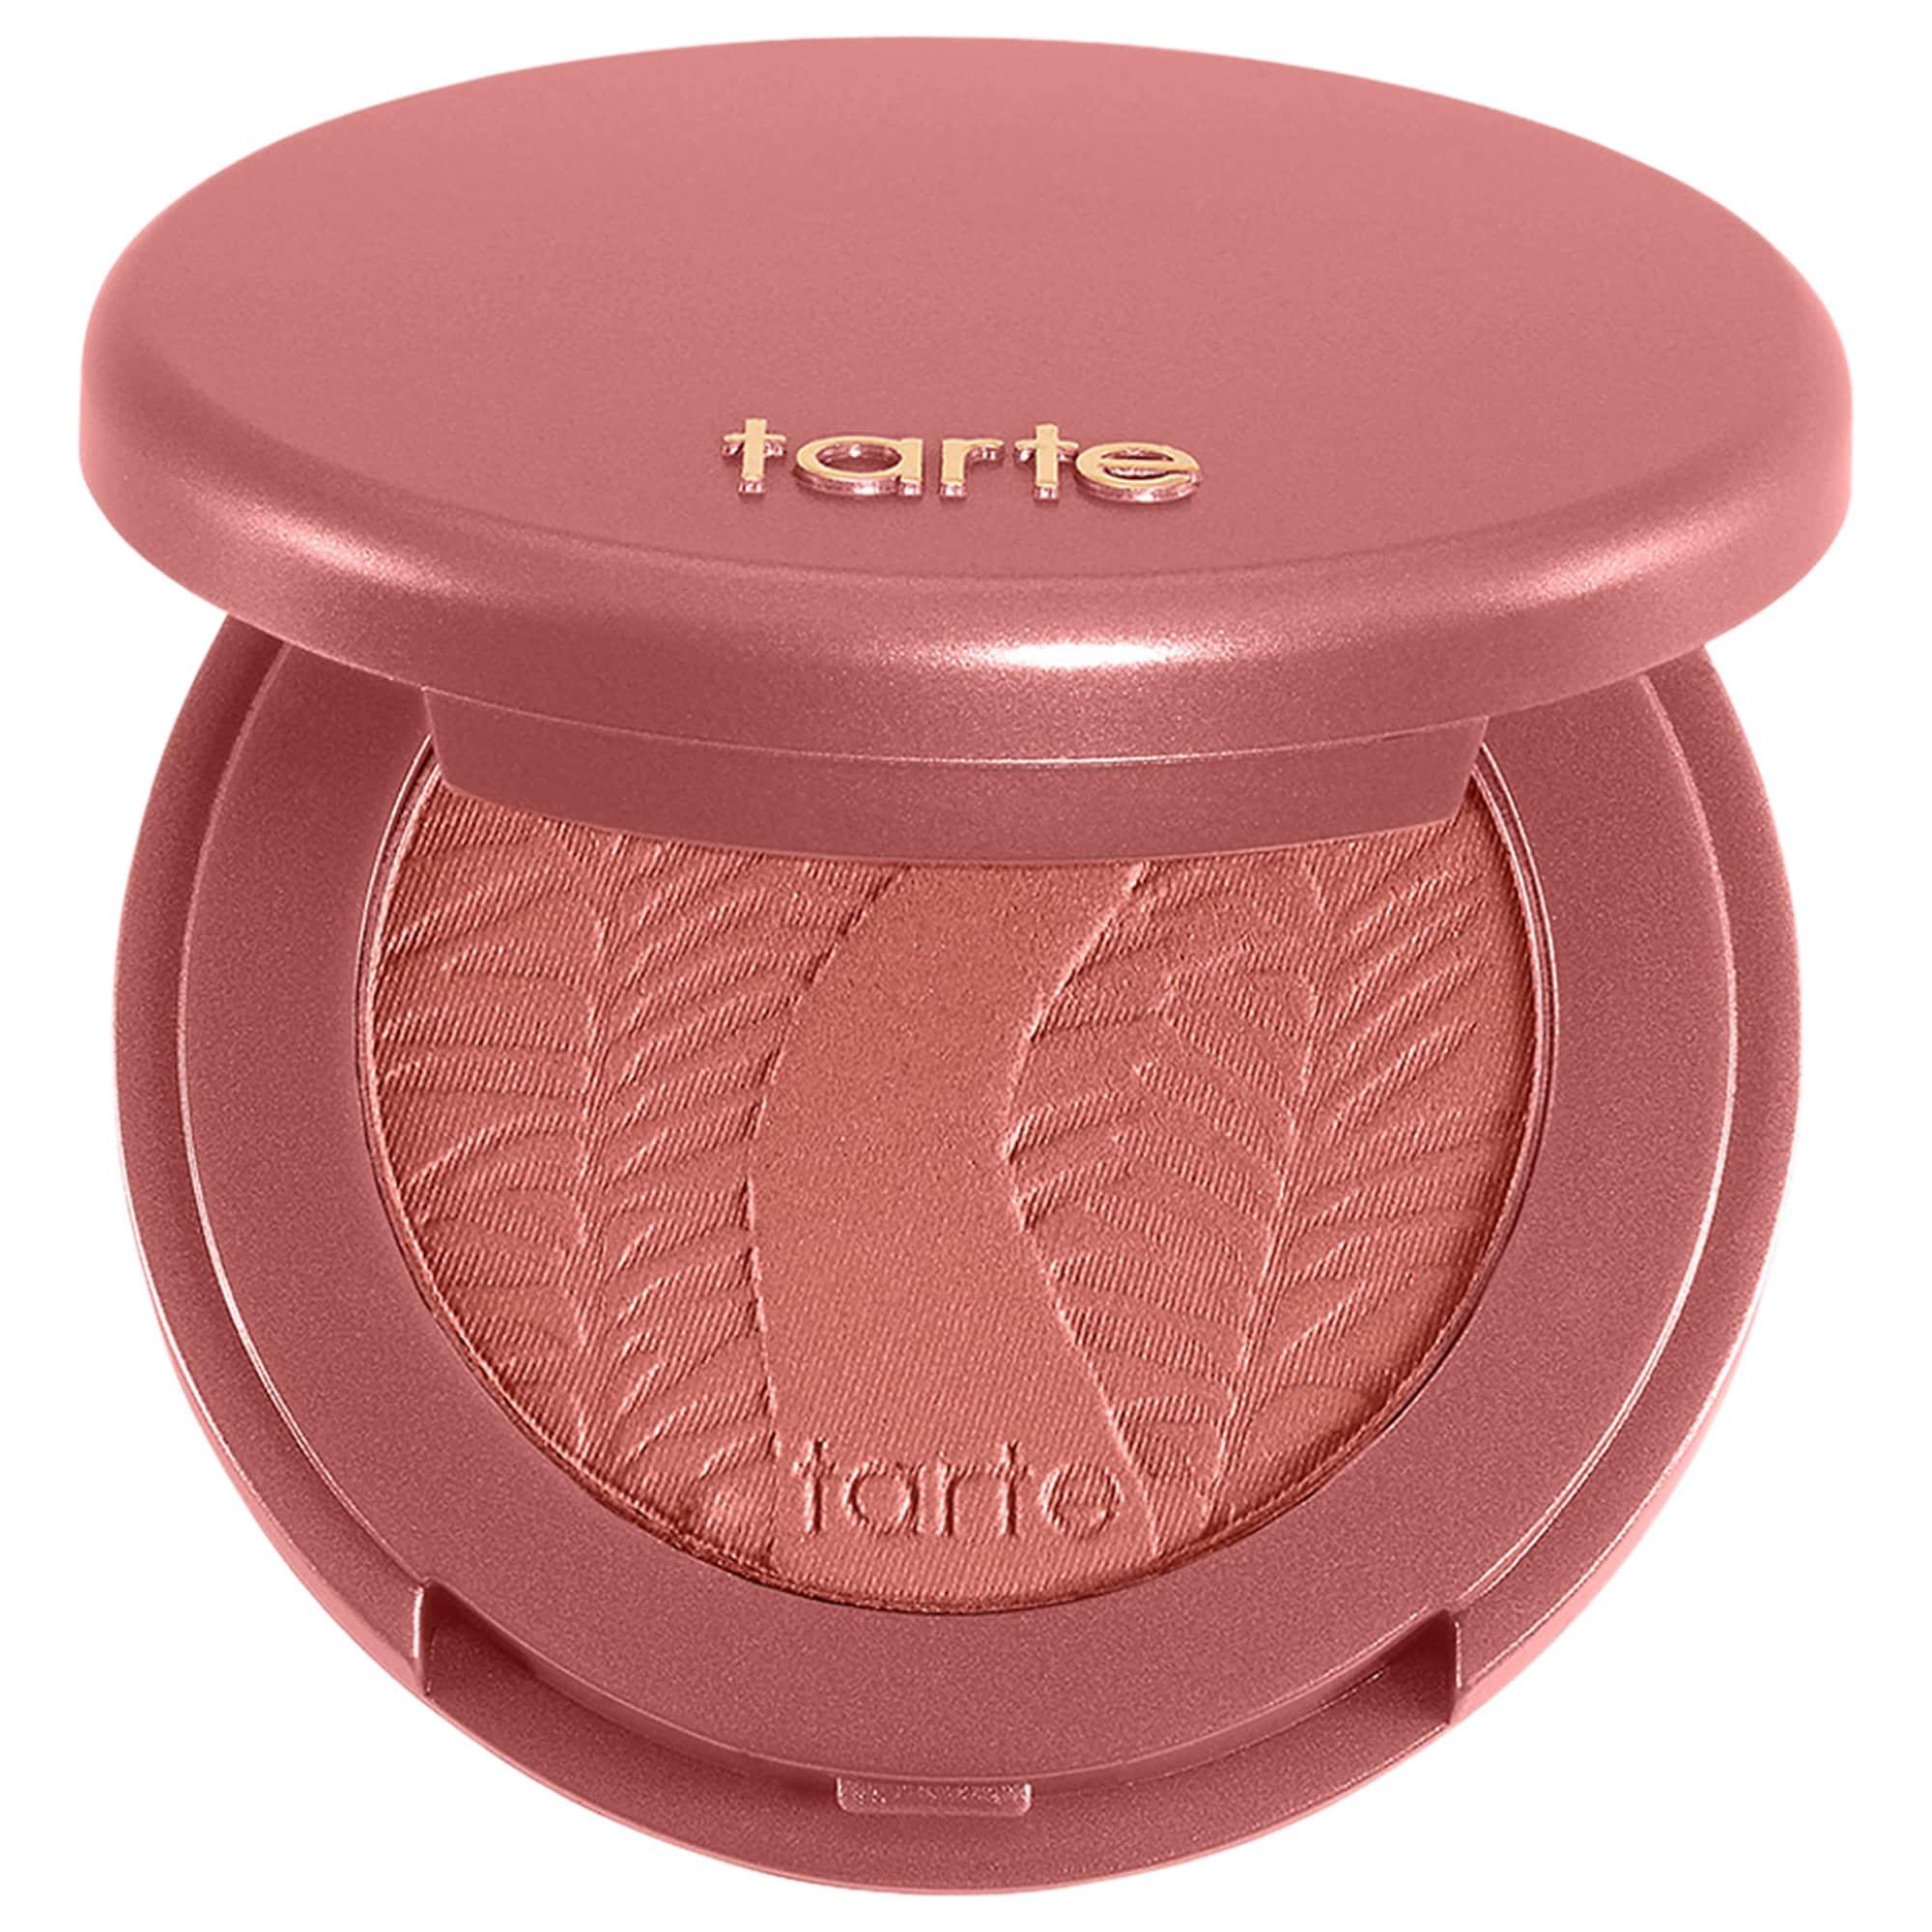 Tarte - Amazonian Clay 12-Hour Blush